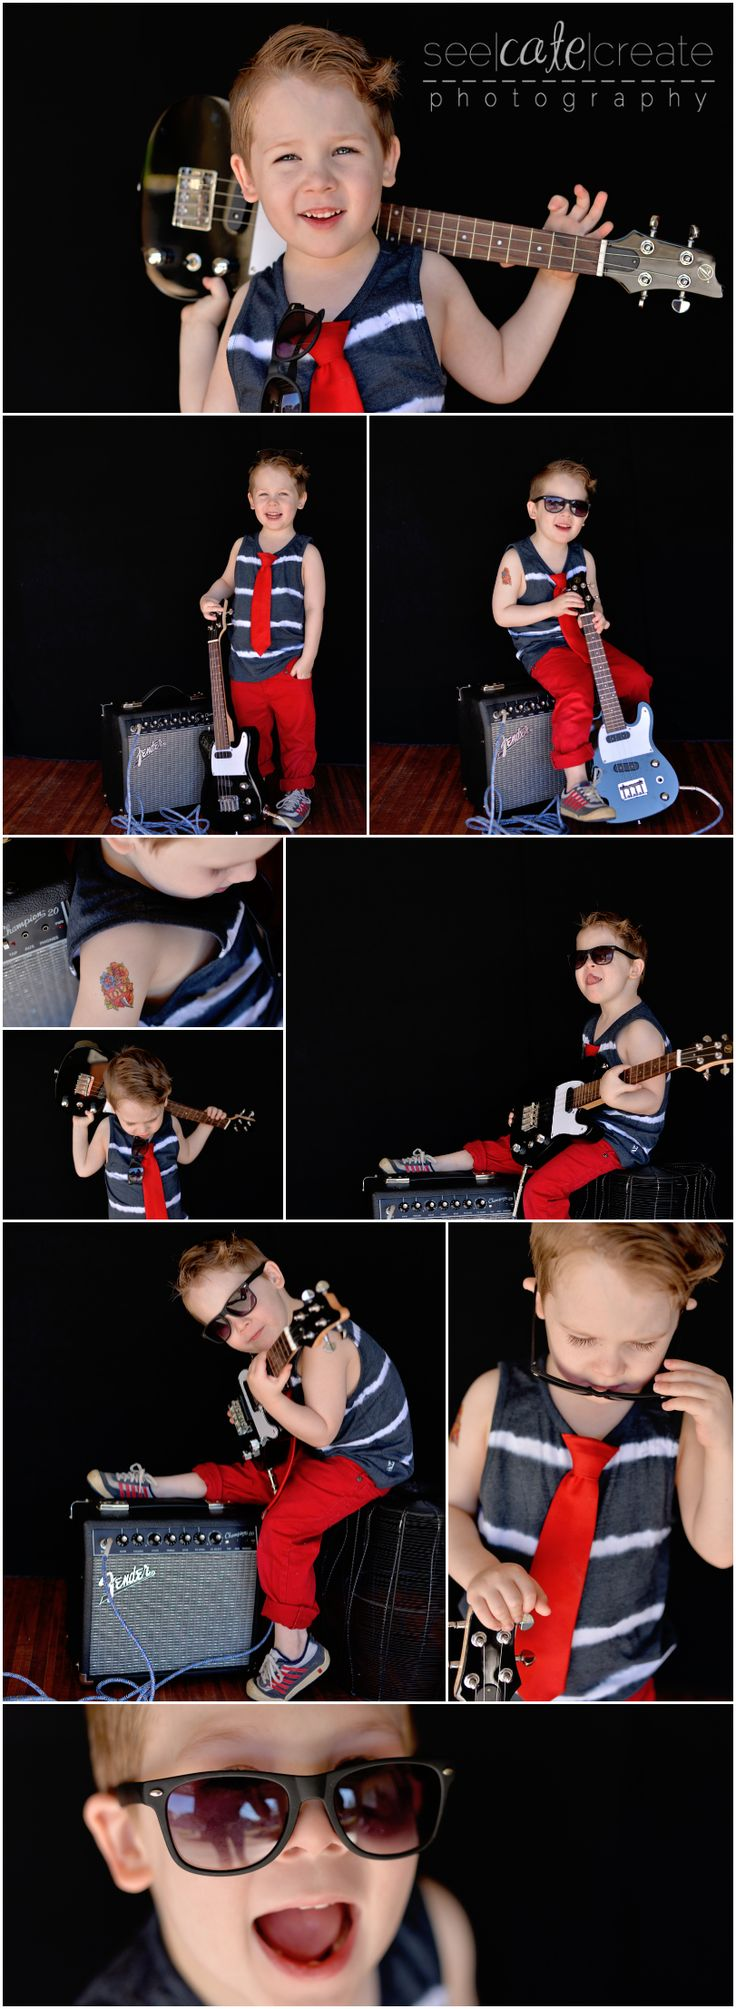 seecatecreate photography little rockstar photoshoot